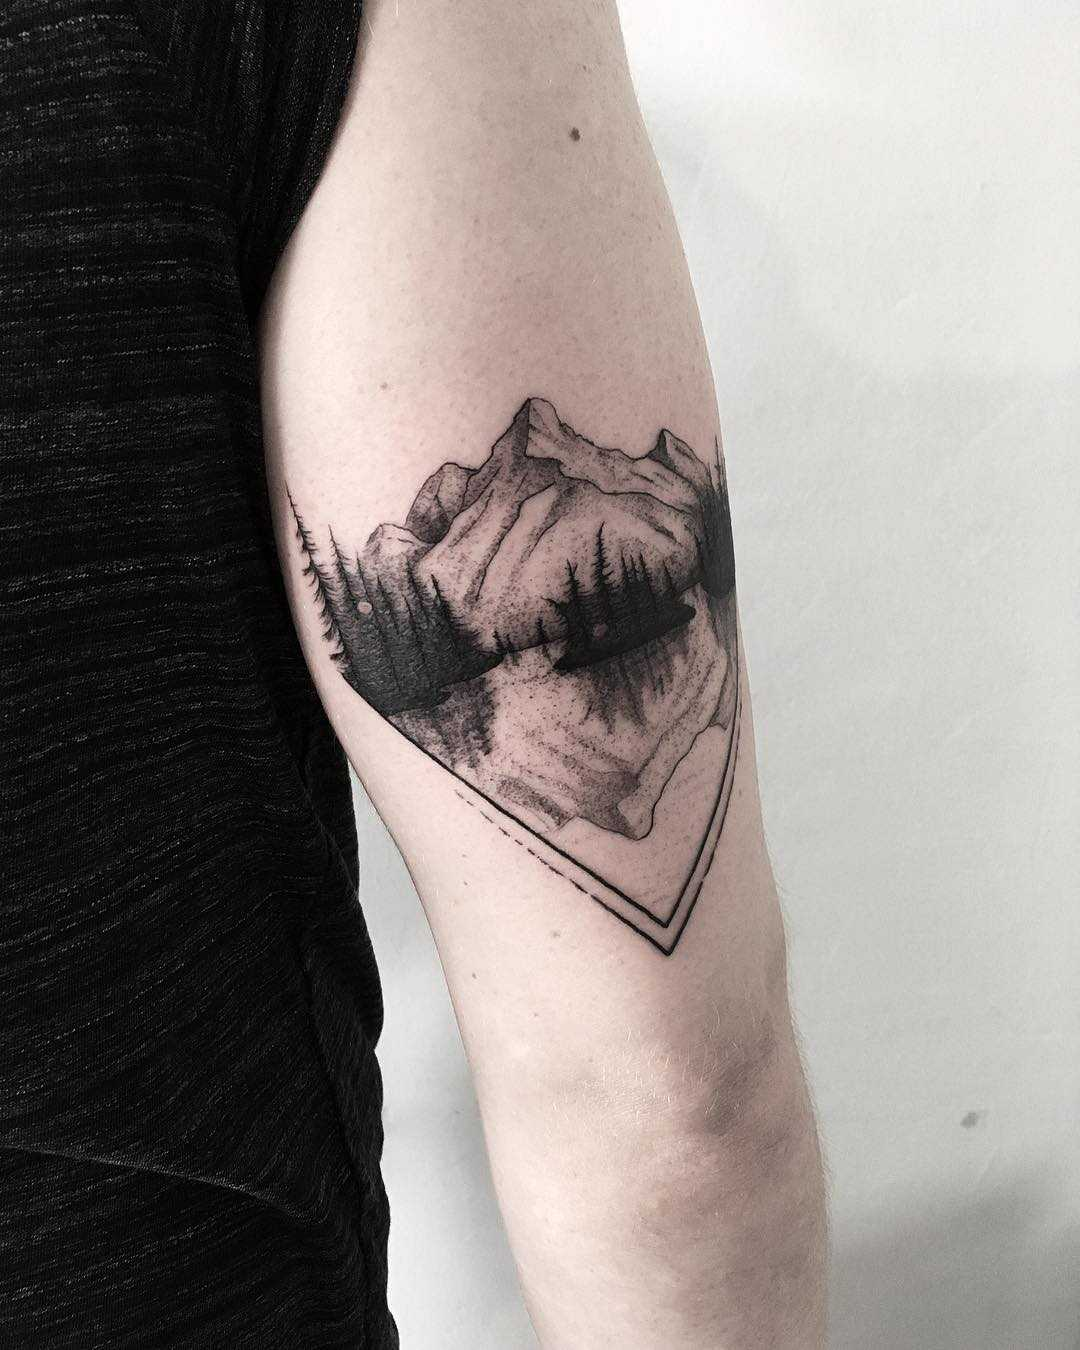 Blackwork mountains by tattooist Spence @zz tattoo